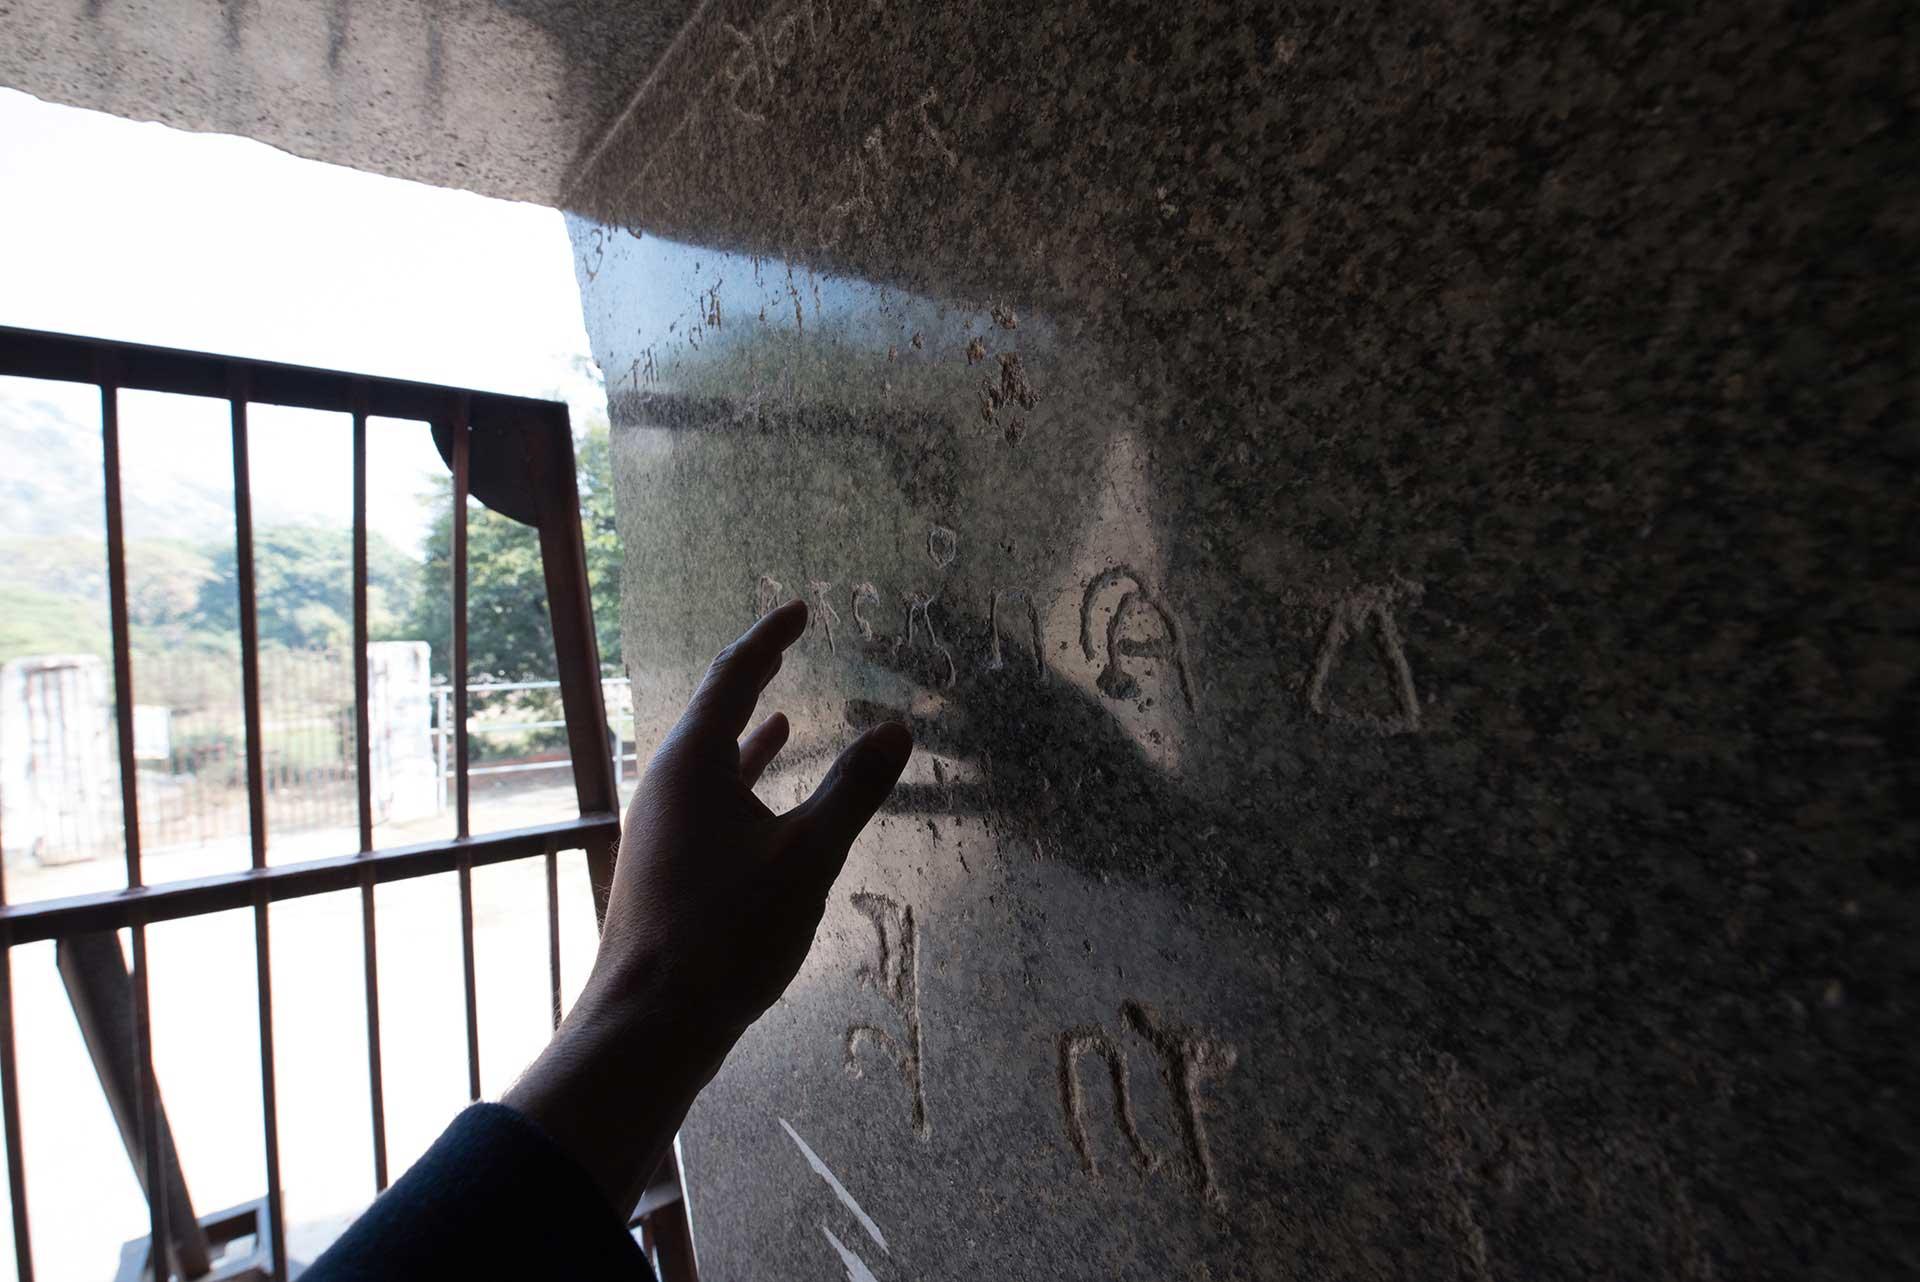 Barabar-BAM-film-granit-miroir-pyramide-inde-yoga-archeologie-02